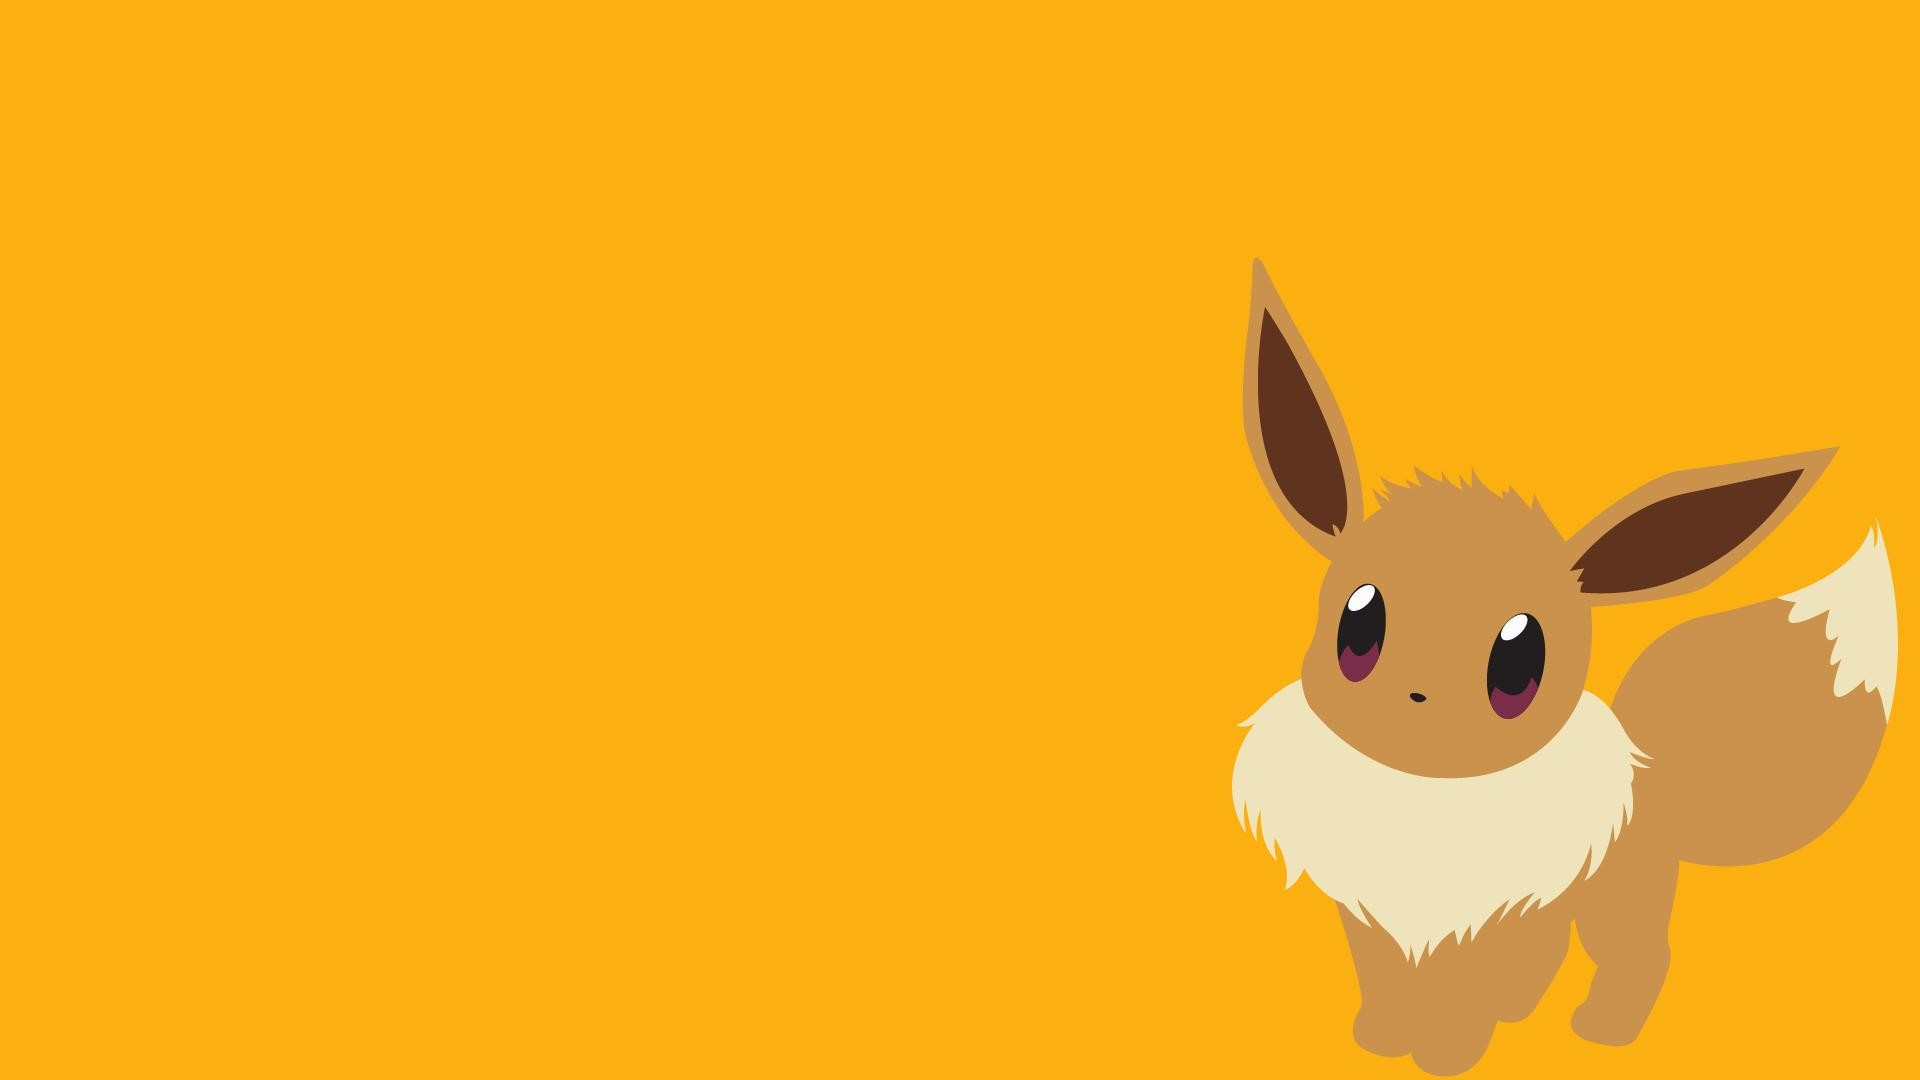 wallpaper.wiki-Pokemon-Phone-Eevee-HD-Wallpaper-PIC-